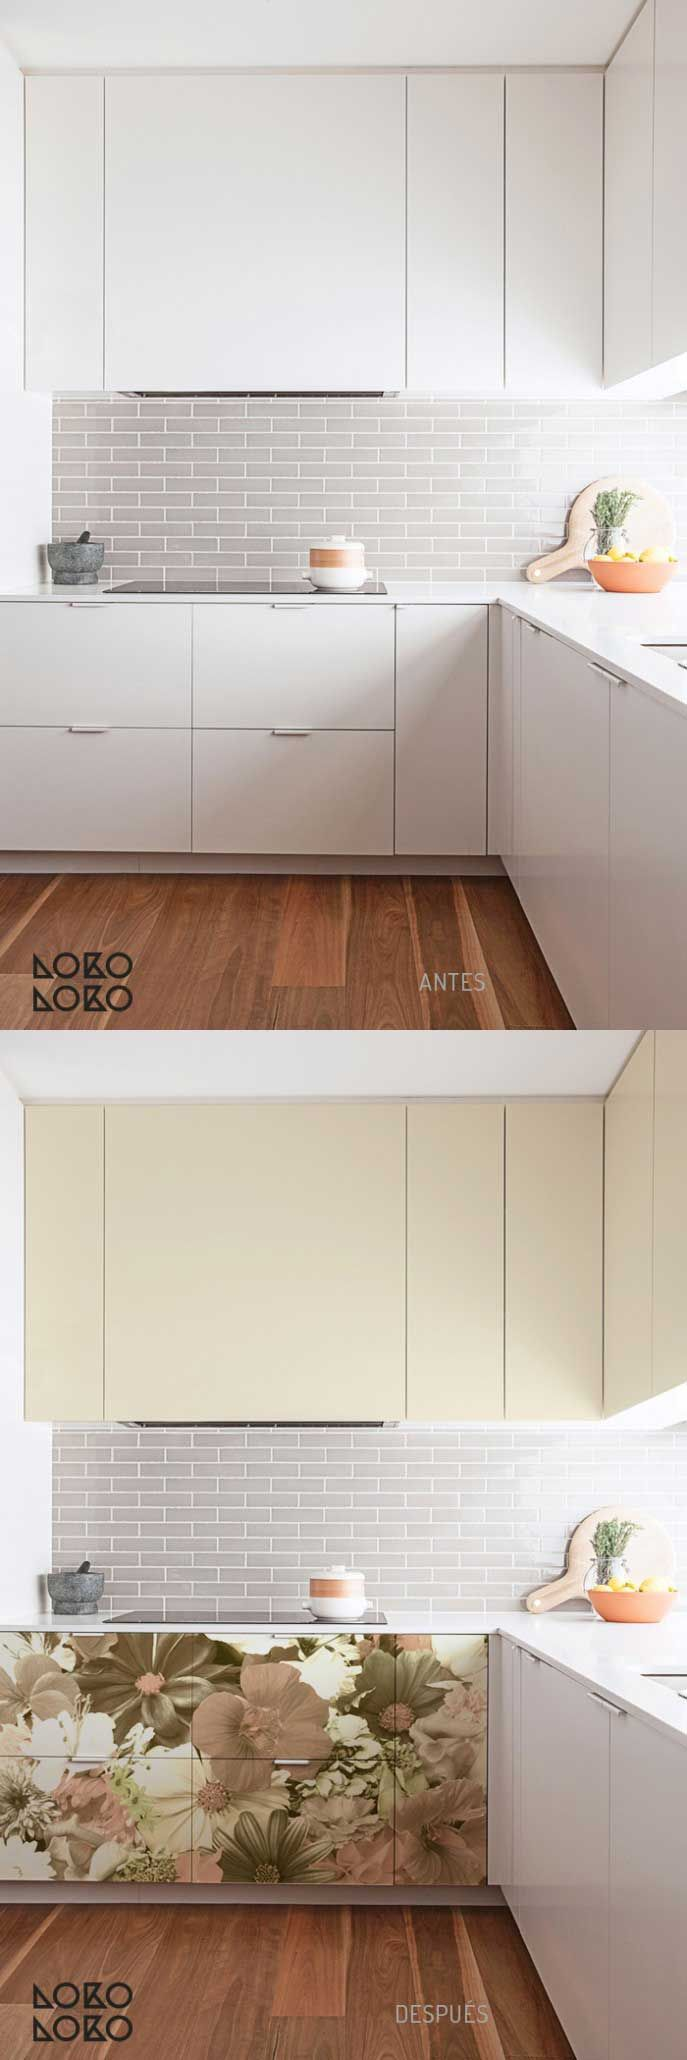 Forrar armarios cocina interesting armario de cocina by - Como forrar muebles de cocina ...